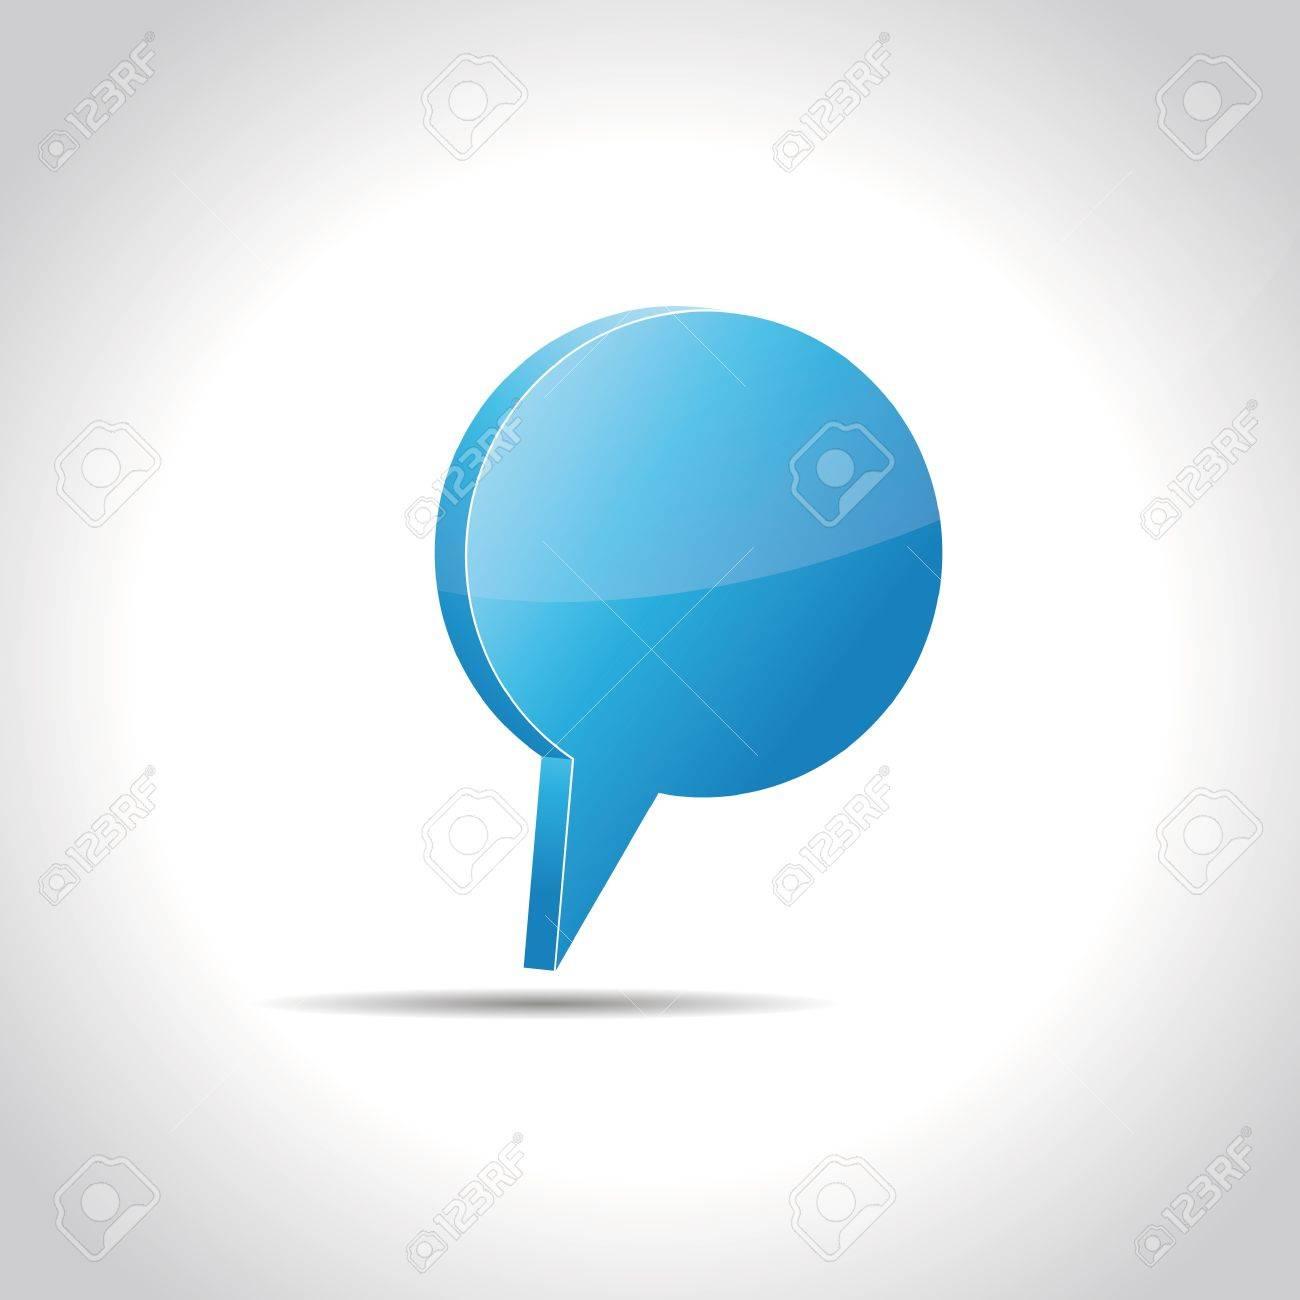 Talking bubble speech bubble thought bubble icon bubble help answer mindmap internet advertising faqs comic Stock Vector - 15362146